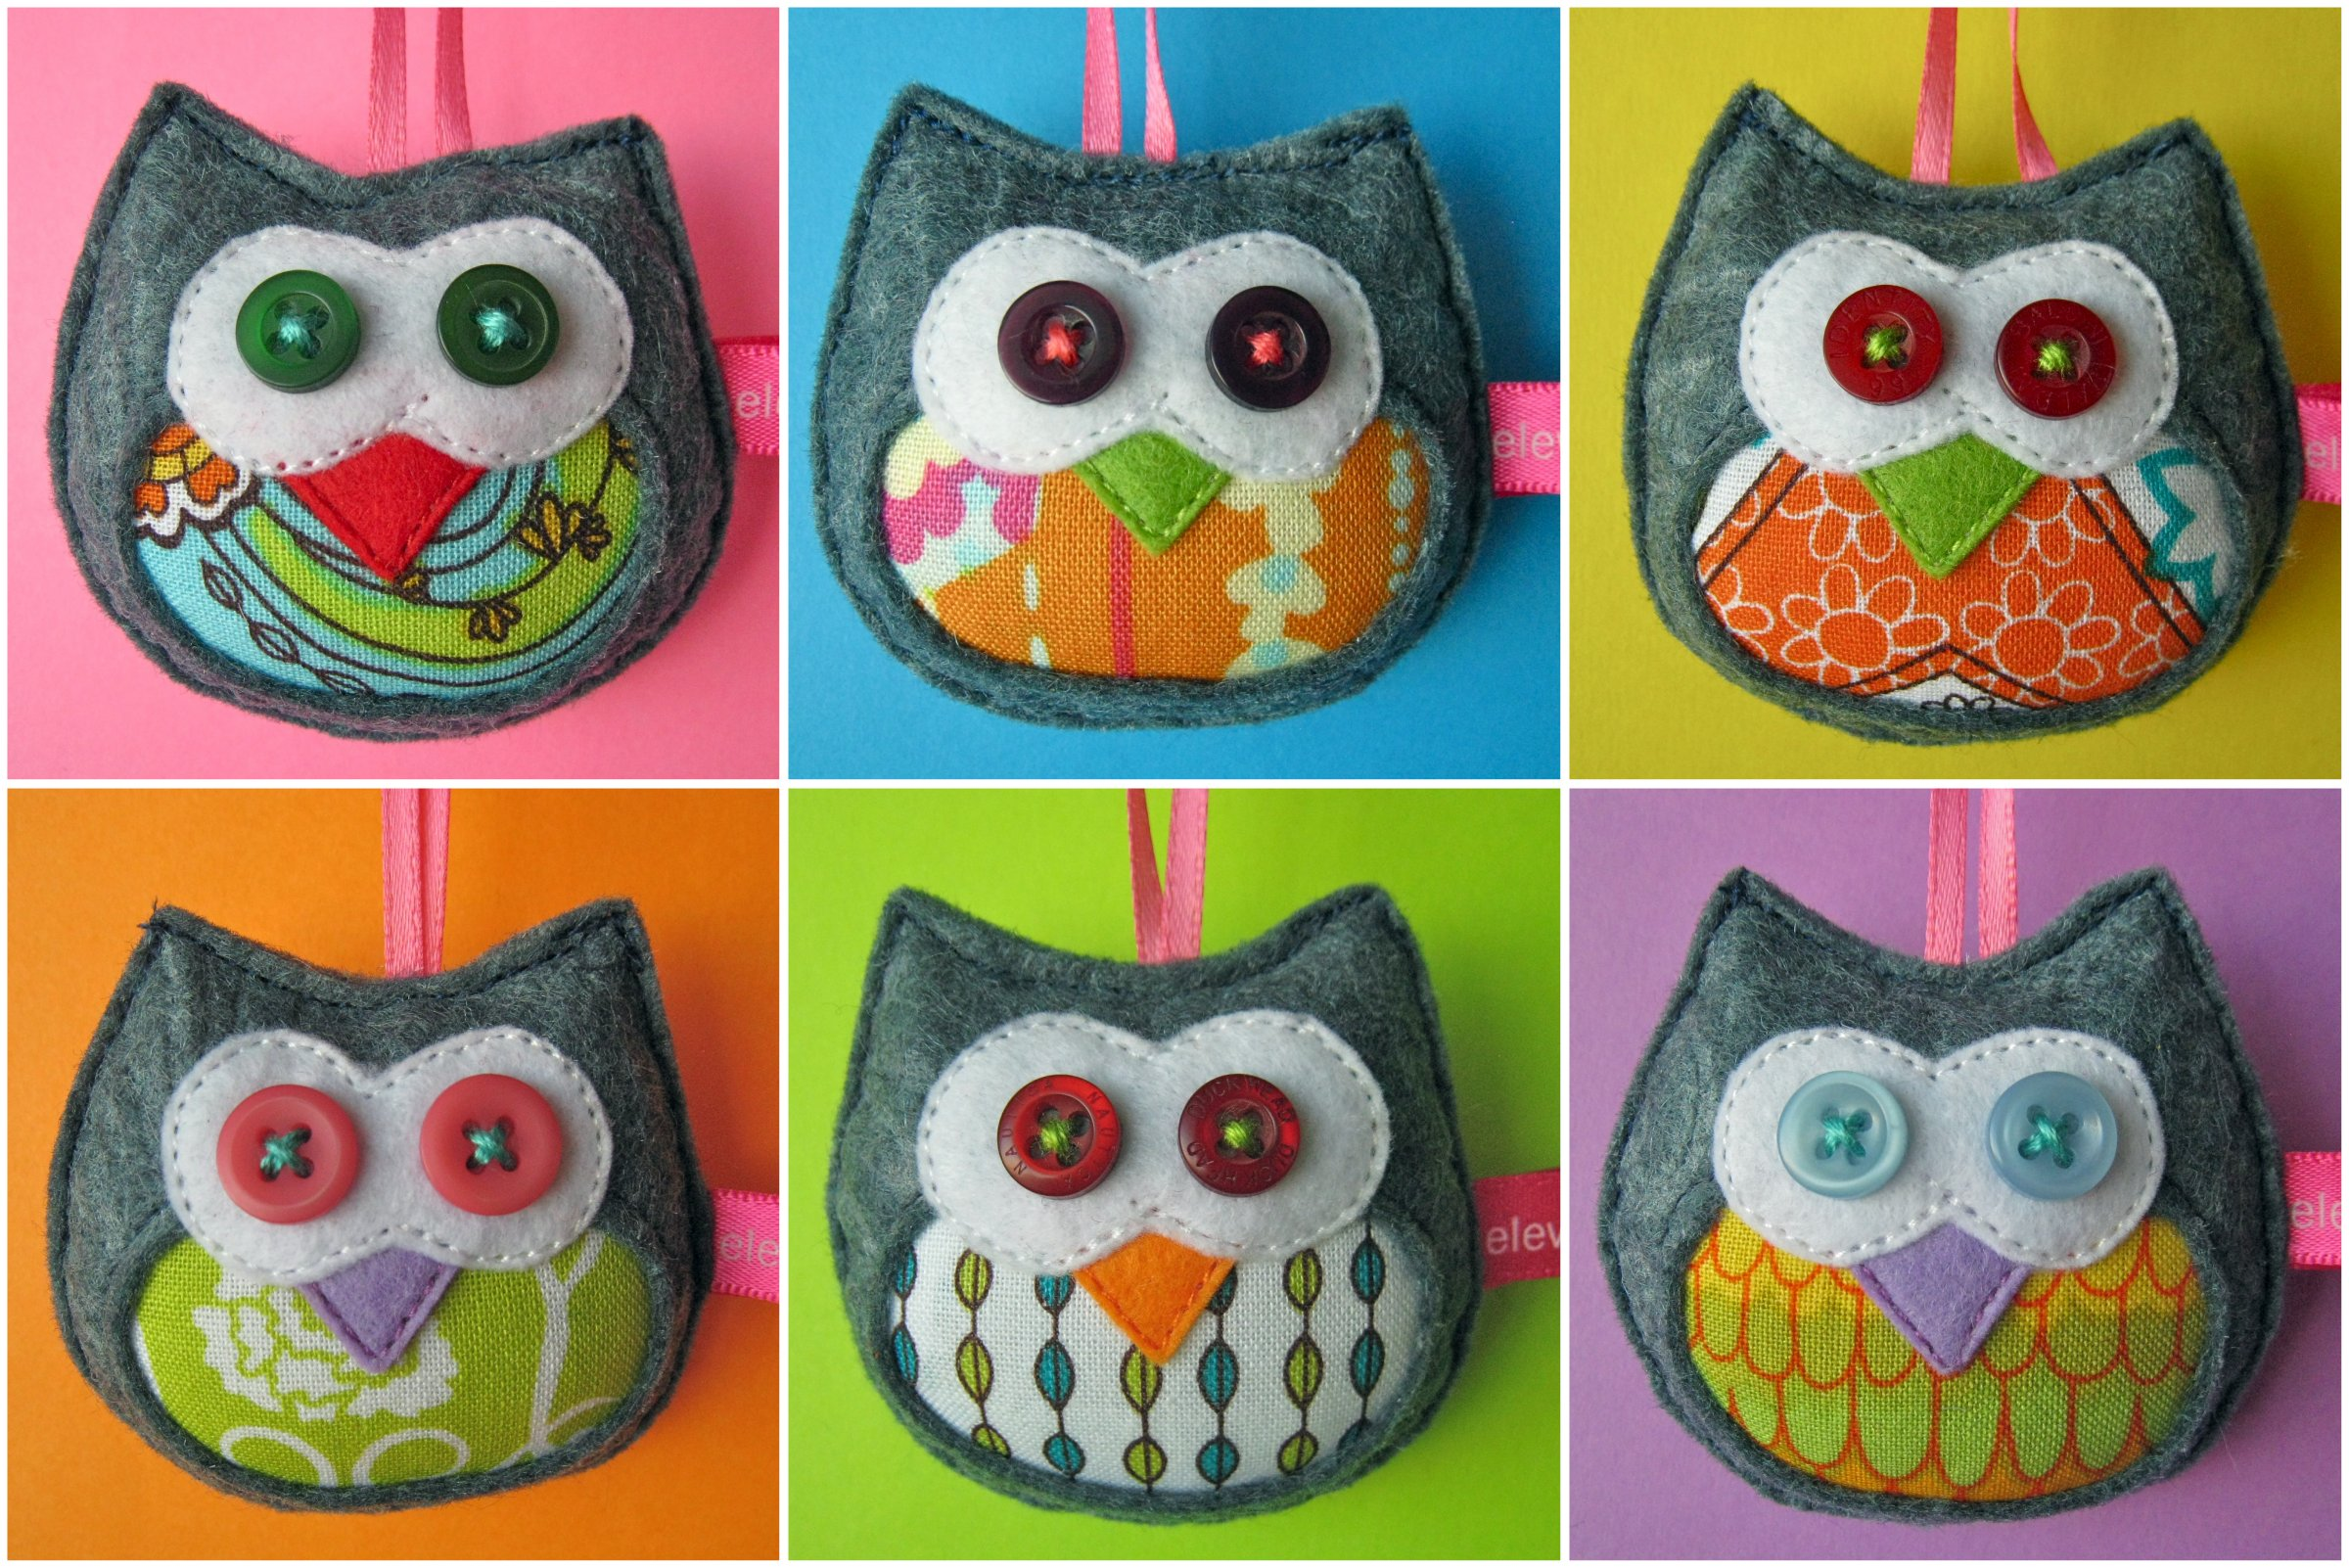 The tiny blue owls